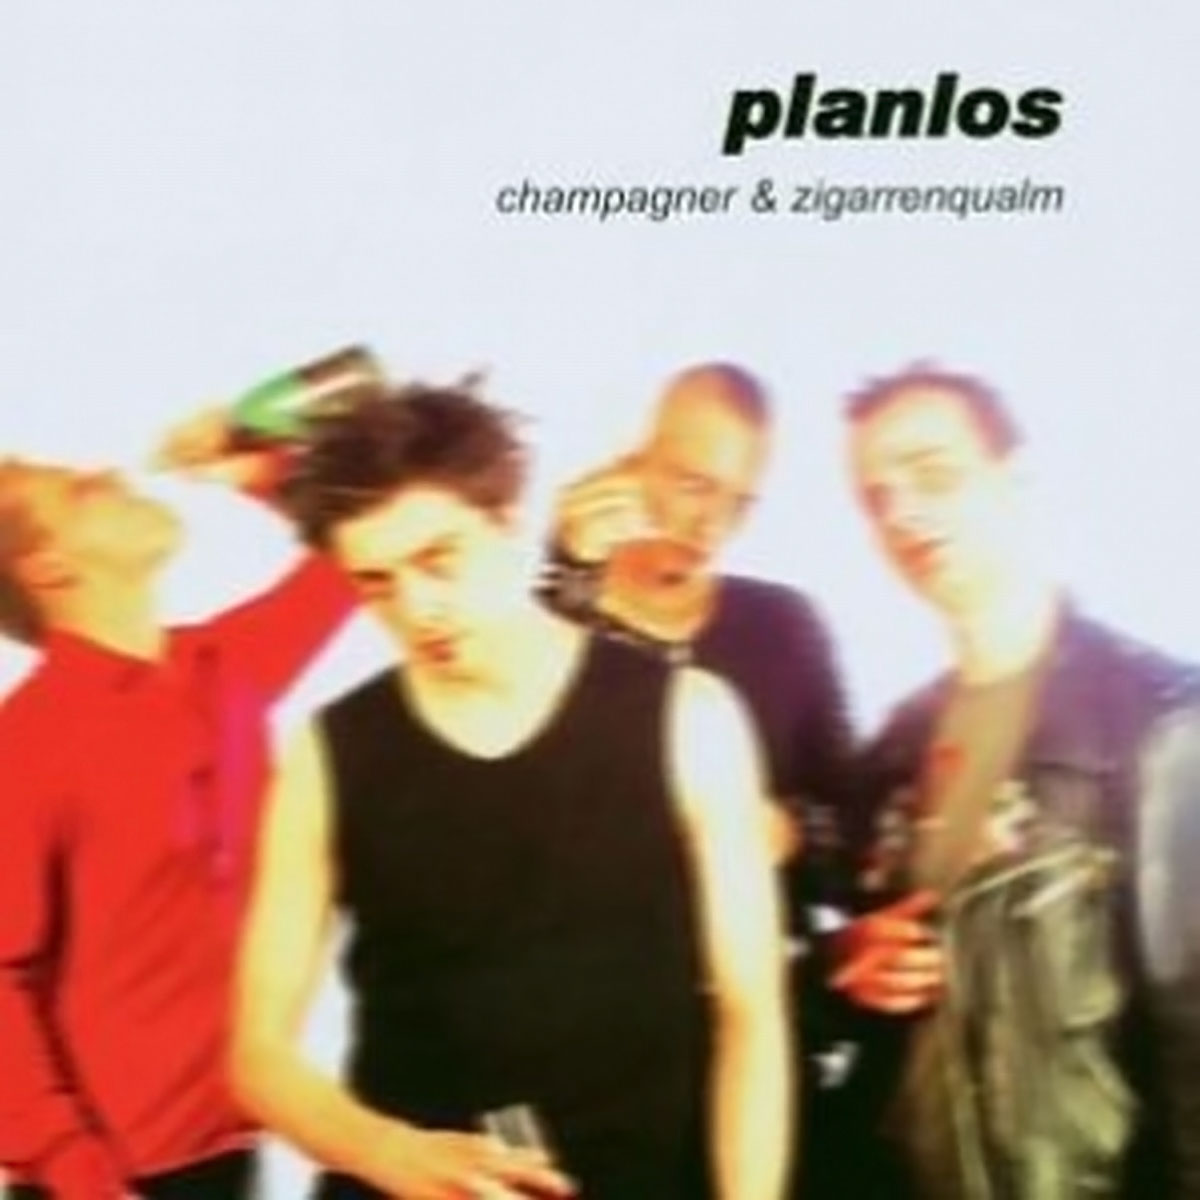 Planlos - Champagner & Zigarrenqualm